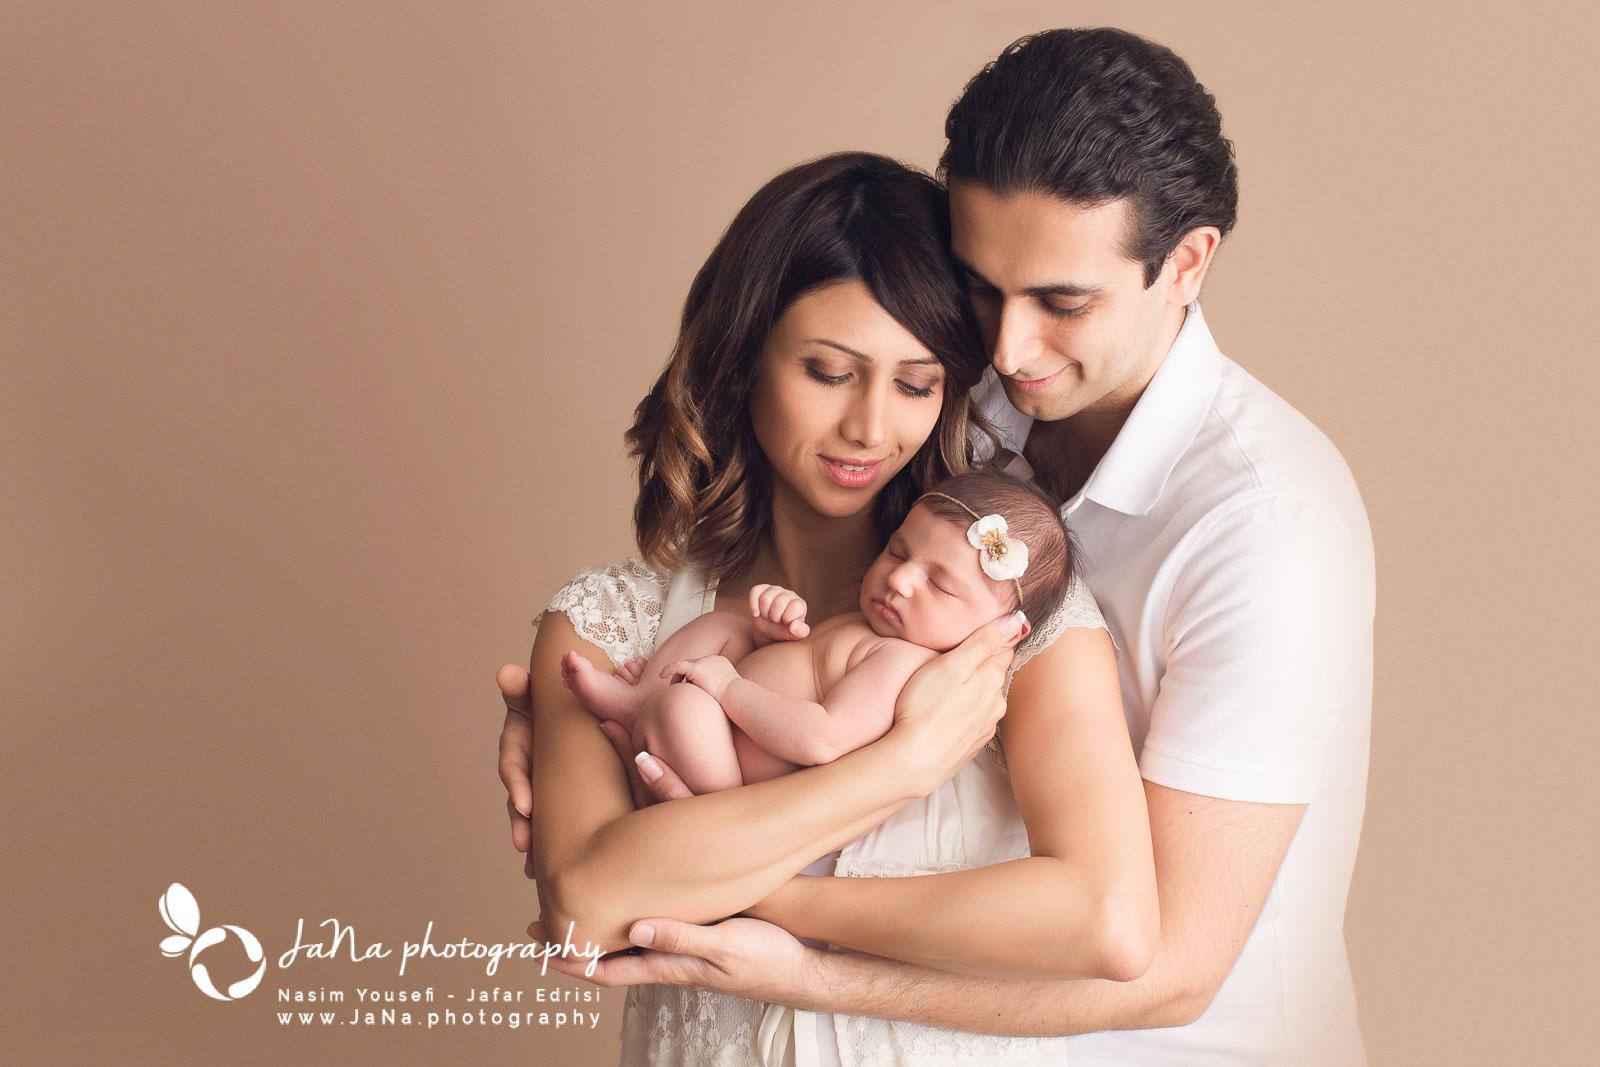 Maternity Newborn photography - Vancouver, Burnaby